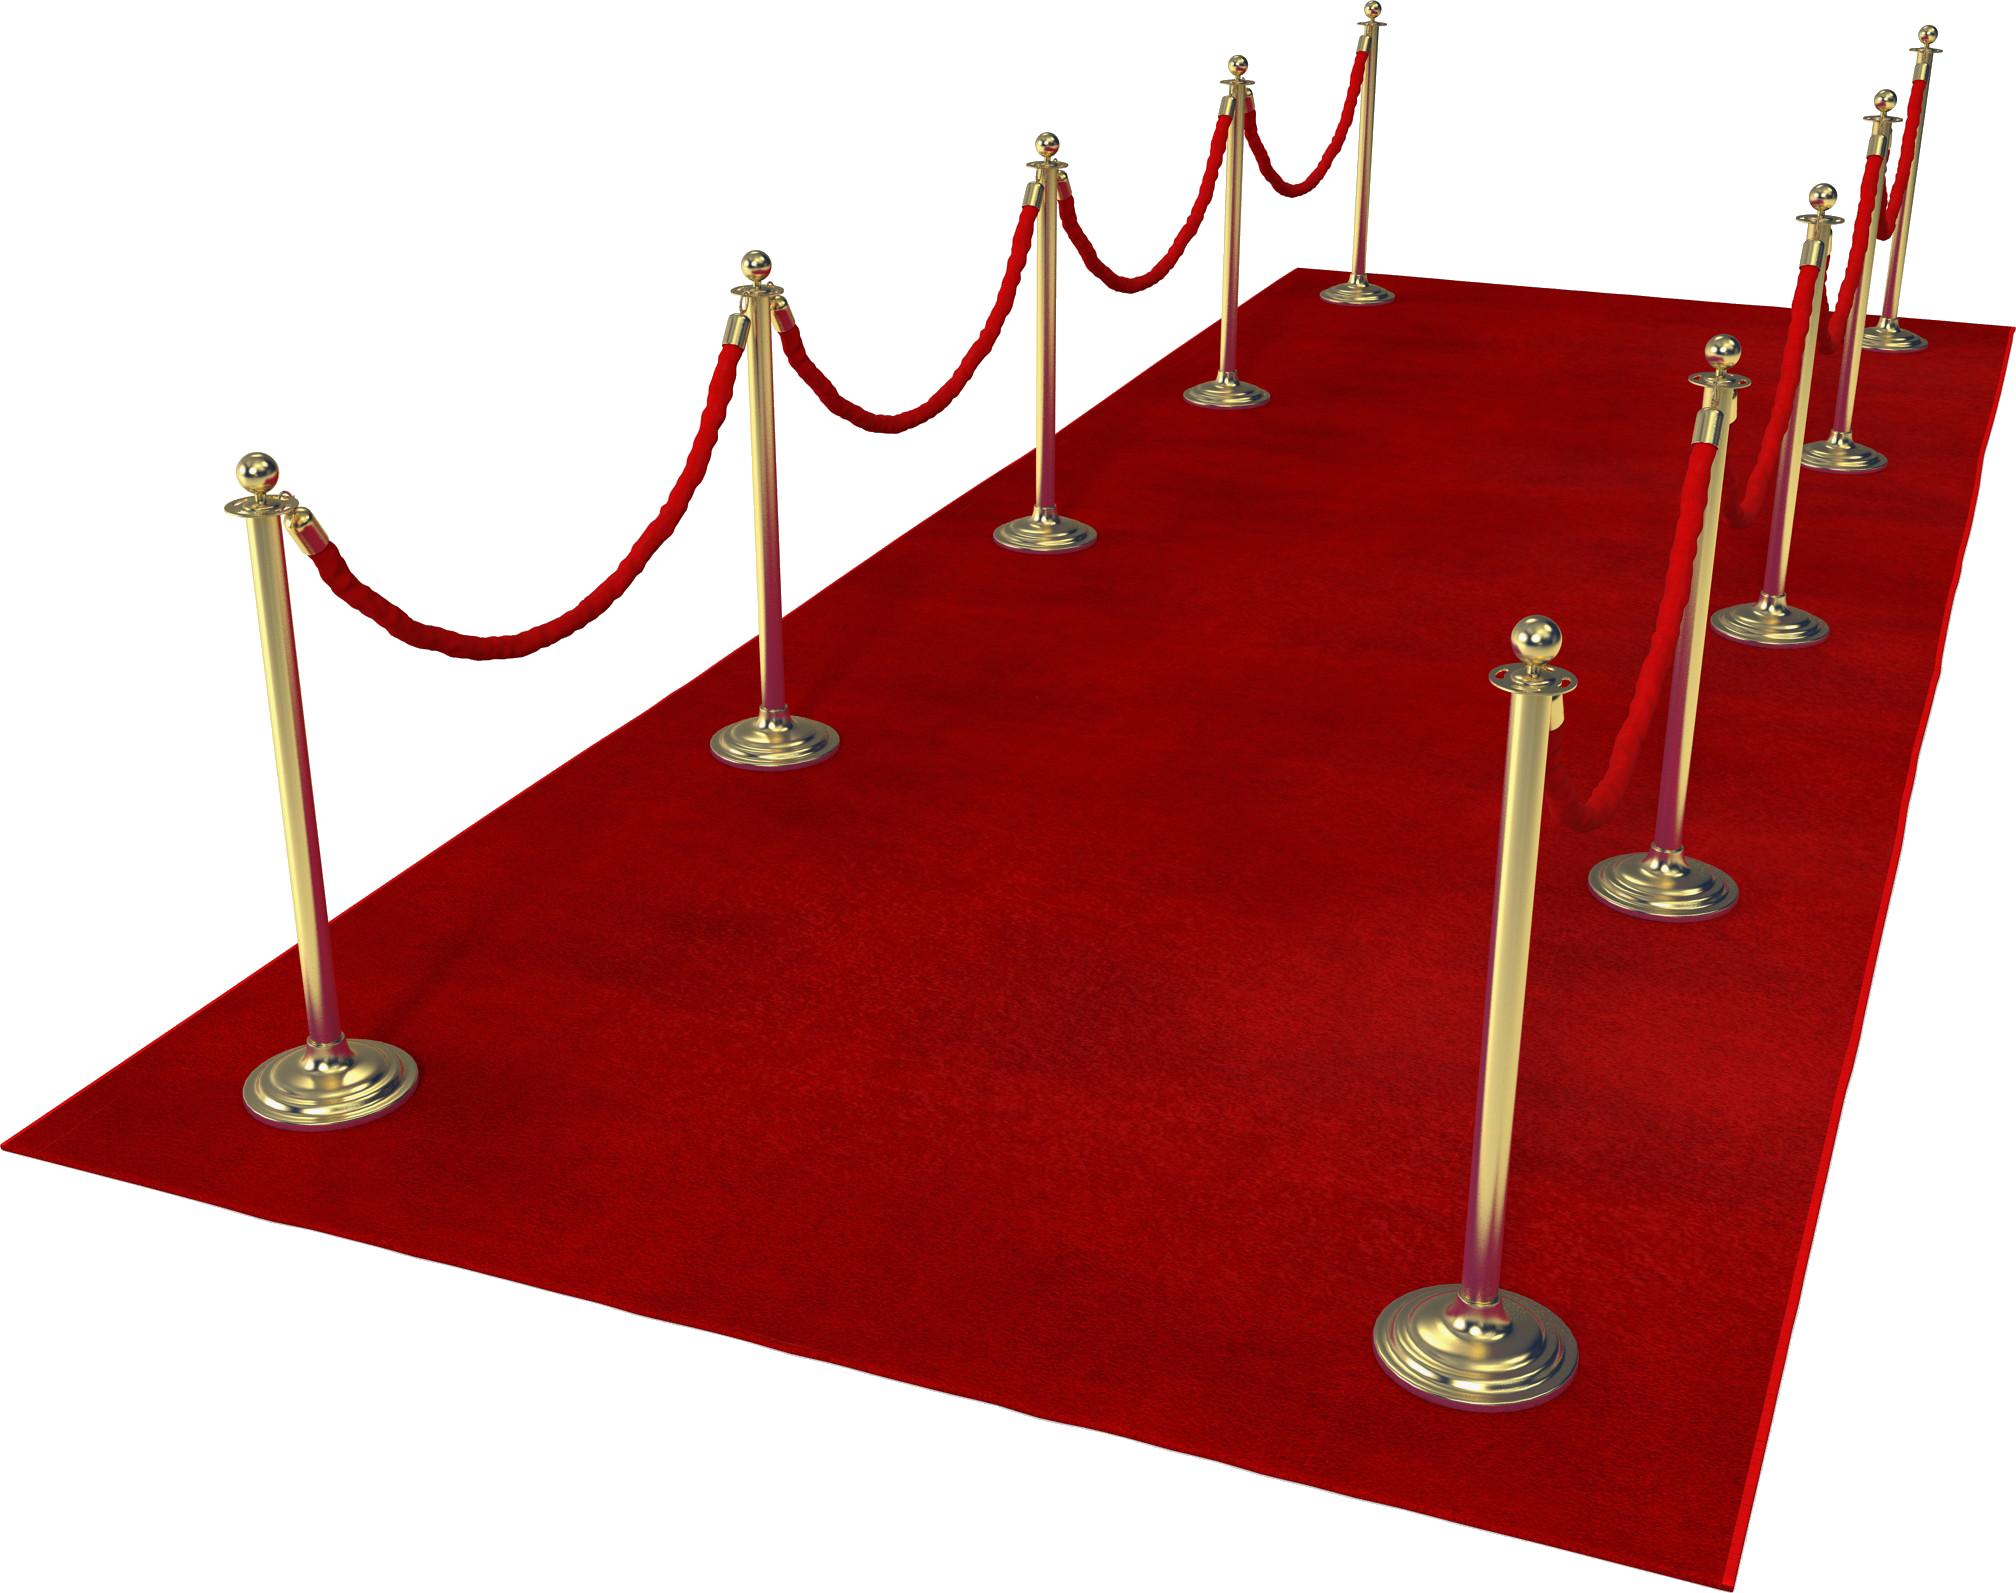 Red Carpet Png Image Blue Carpet Red Carpet Backdrop Diy Red Carpet